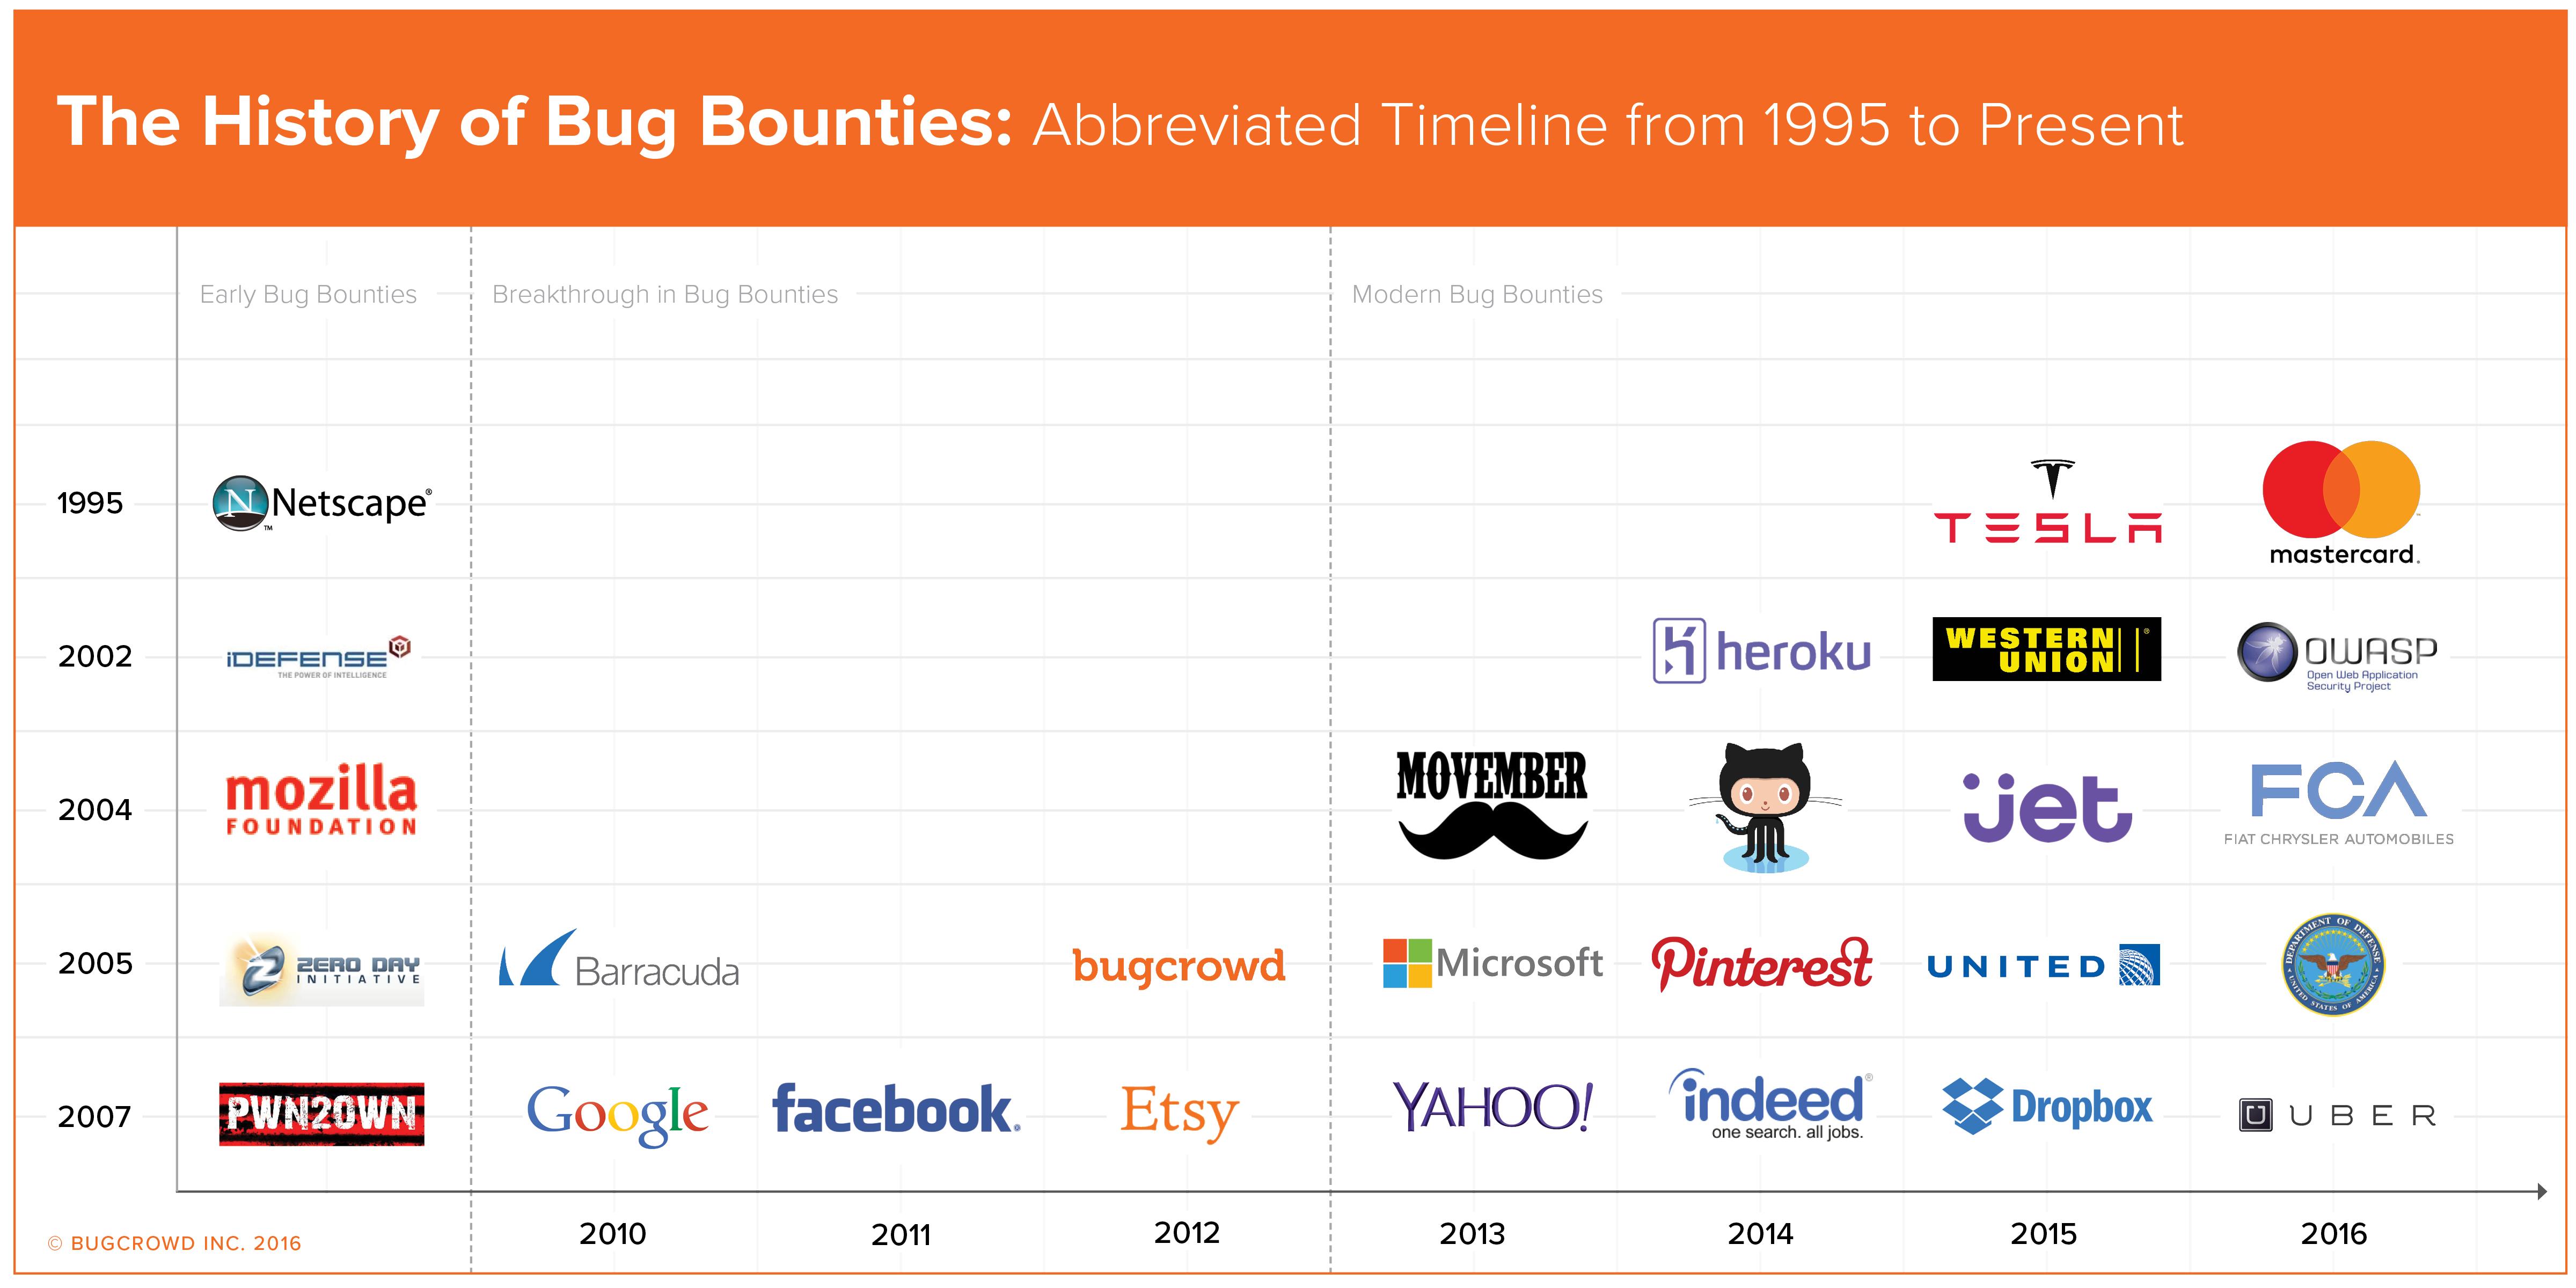 History of Bug Bounties